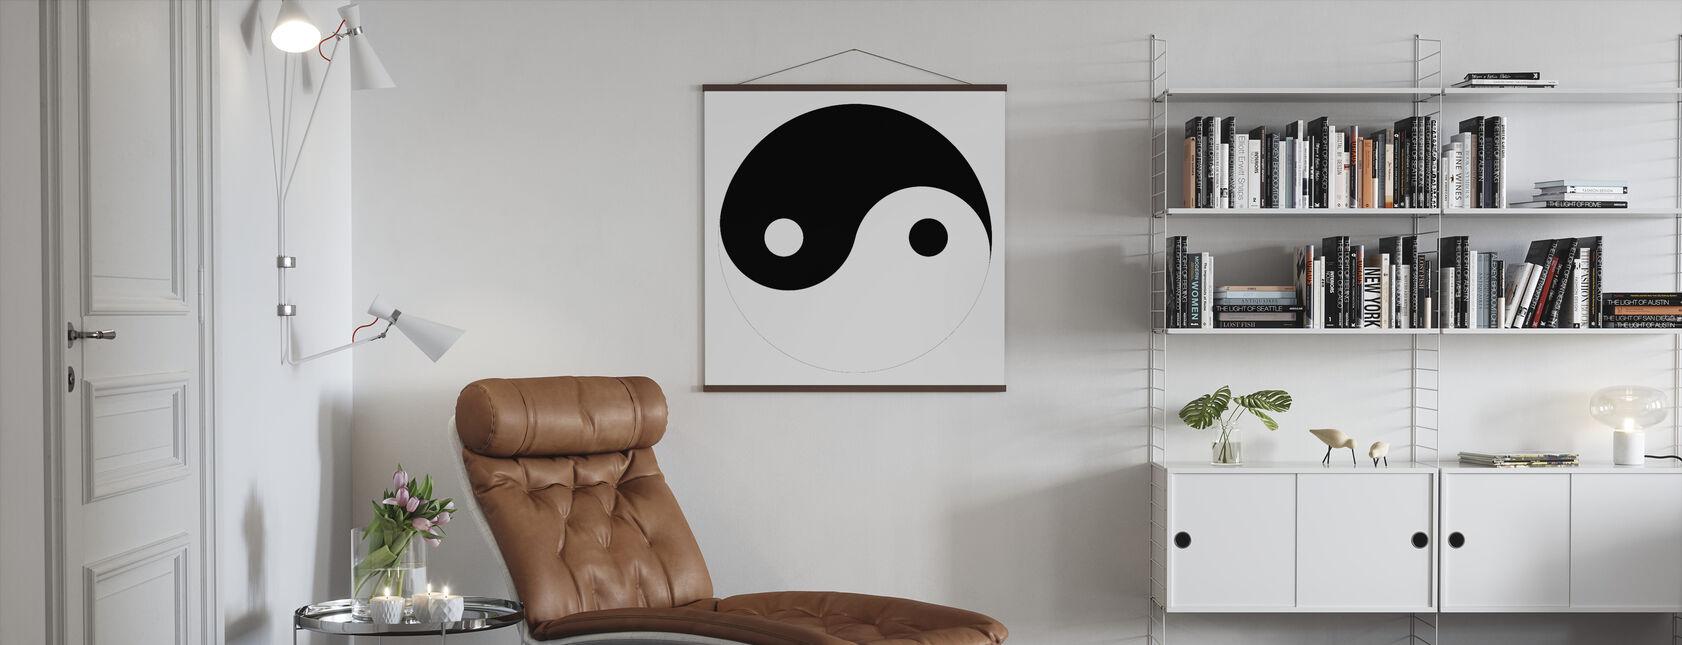 Yin-Yang - Poster - Living Room